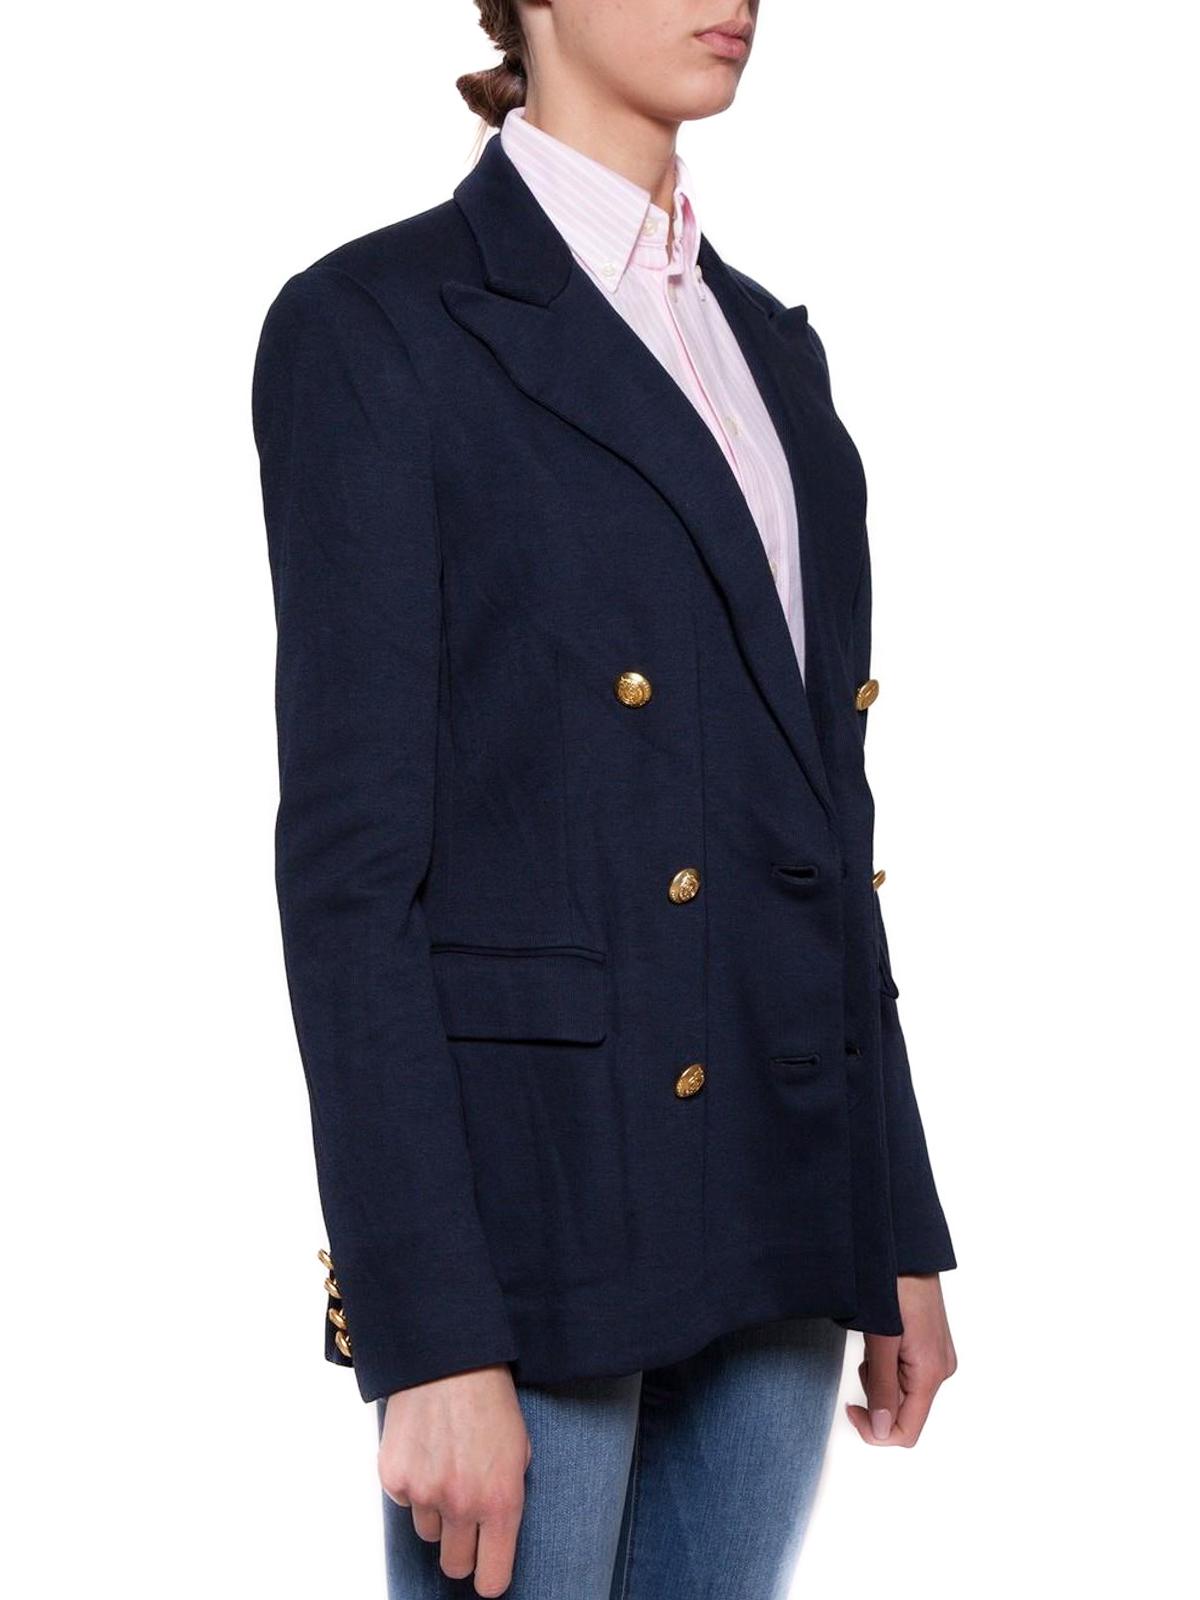 69ec10a674887 Polo Ralph Lauren - Knit cotton blend blazer - blazers - 211659996001